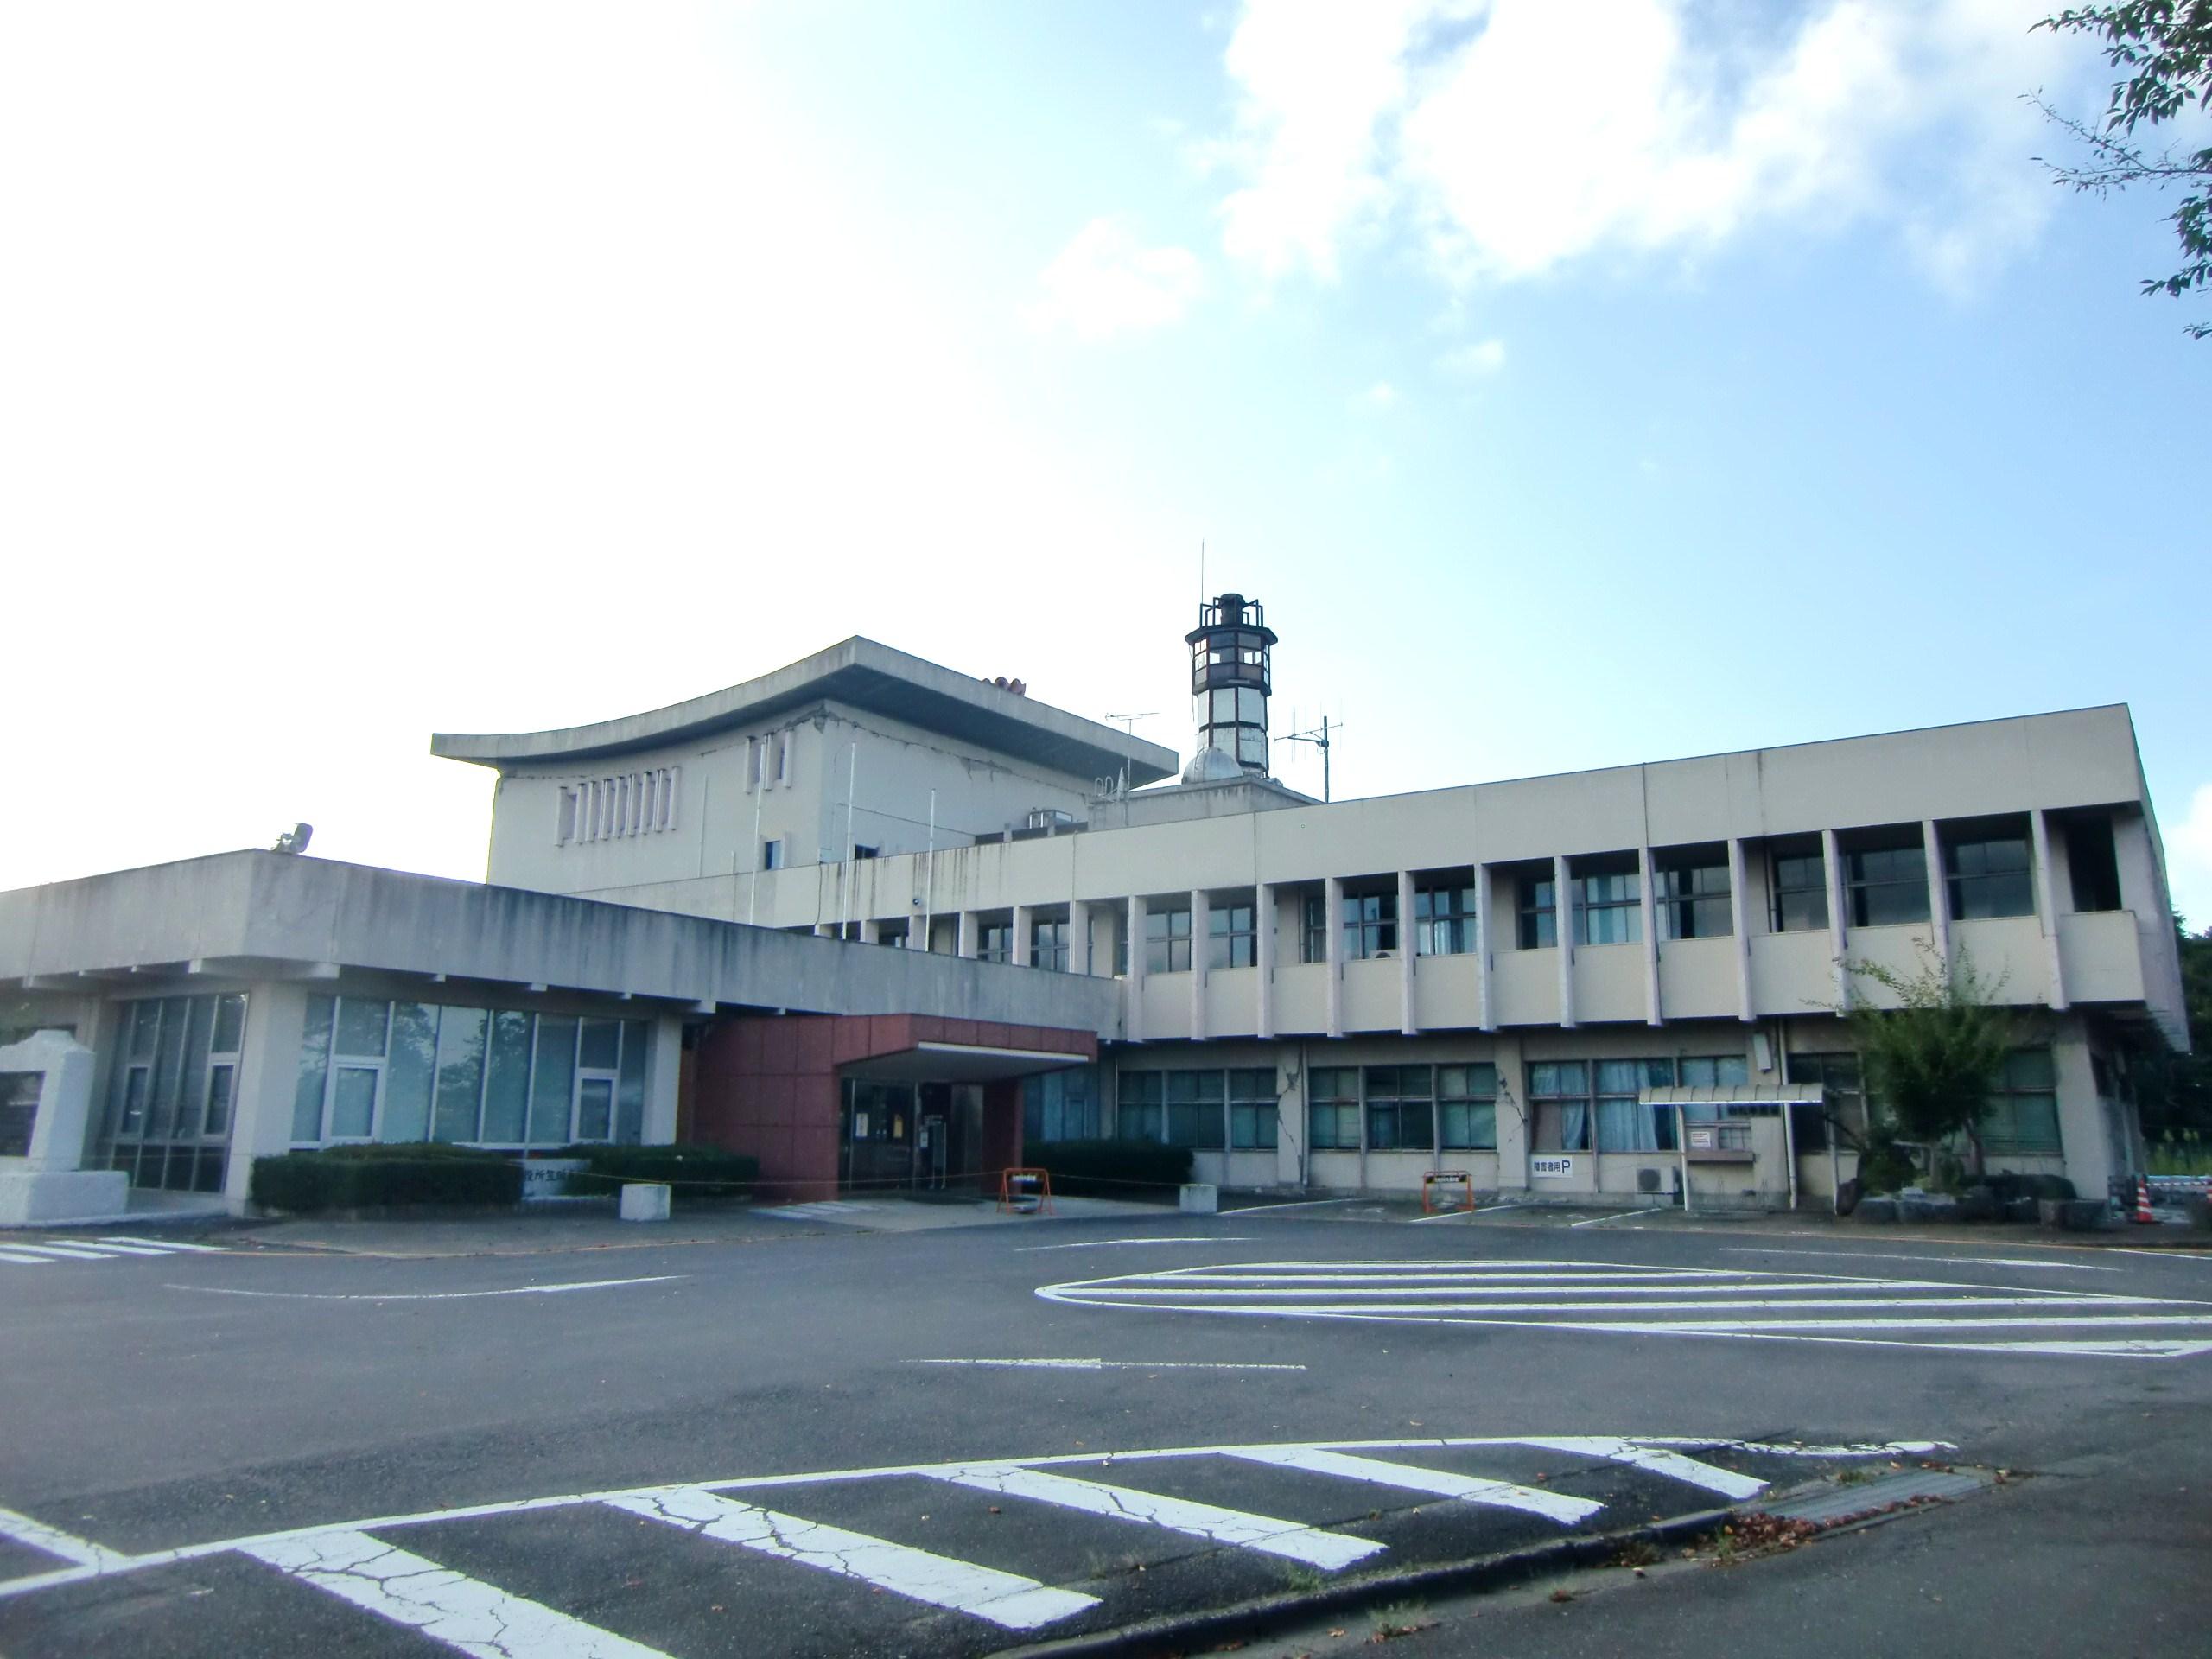 笠間市 - Kasama, Ibaraki - JapaneseClass.jp